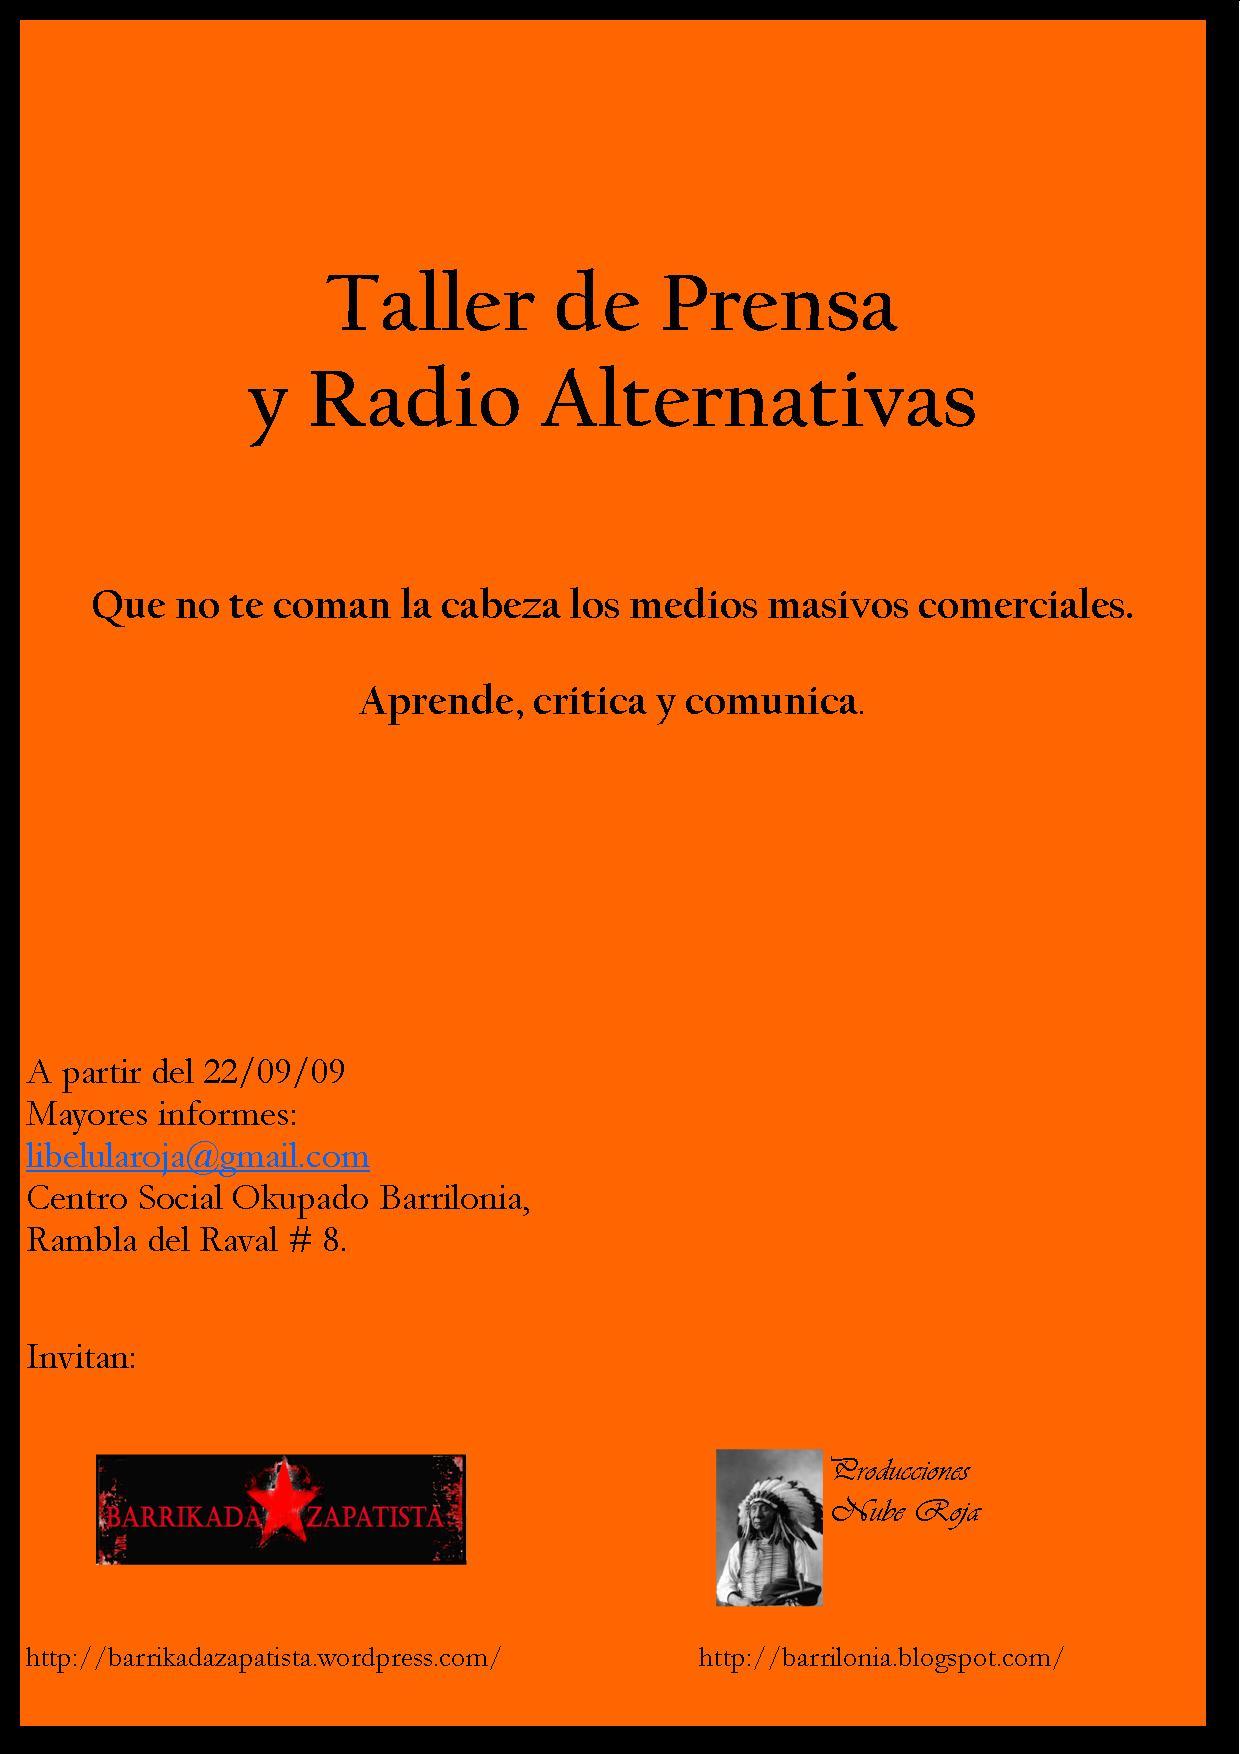 jpg_Taller_prensa_y_radio.jpg